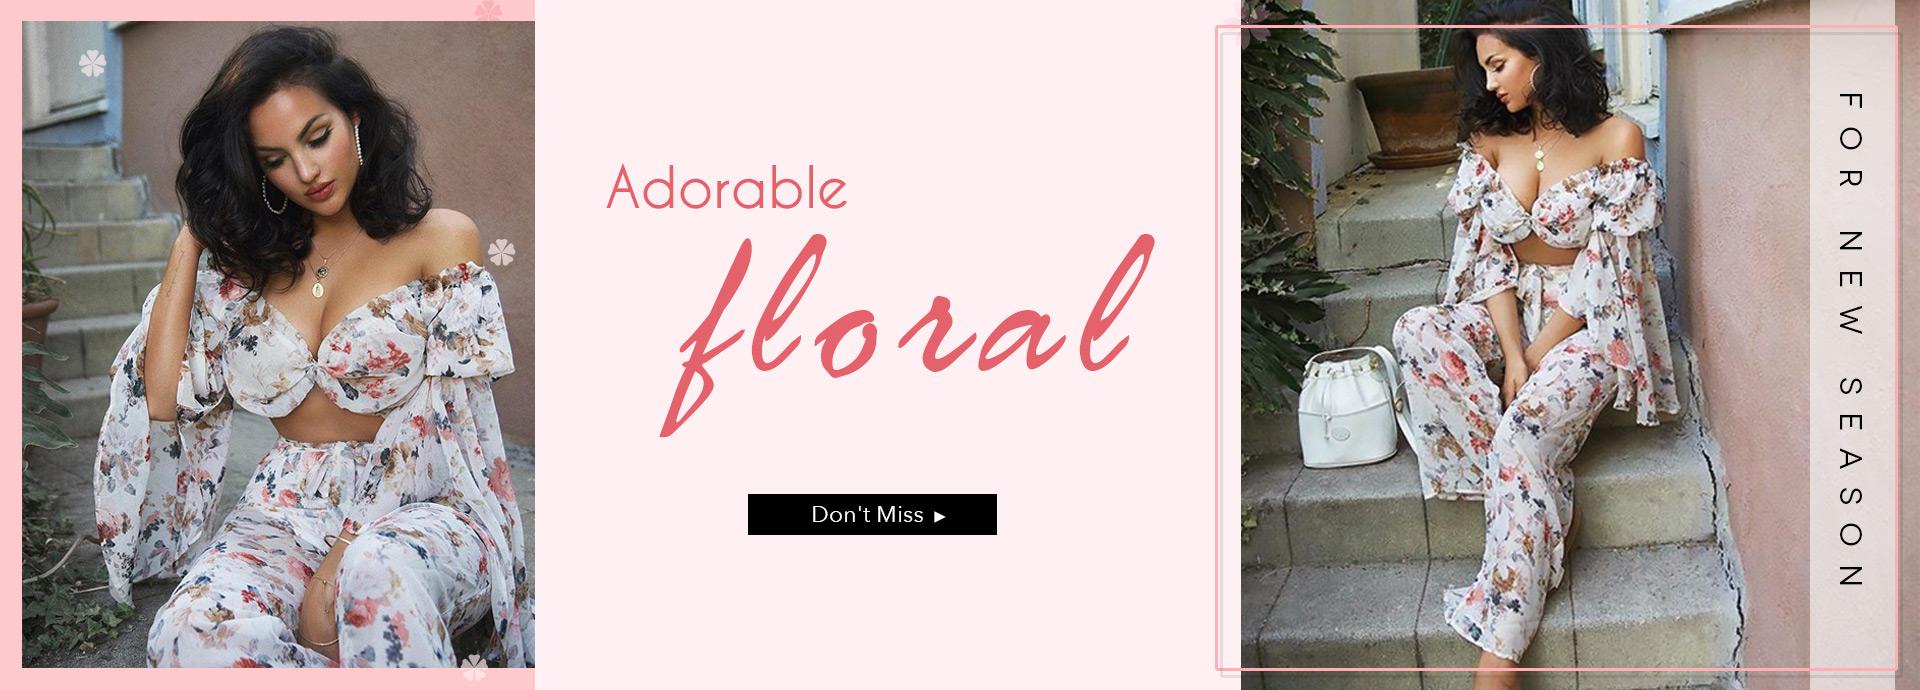 Adorable Floral